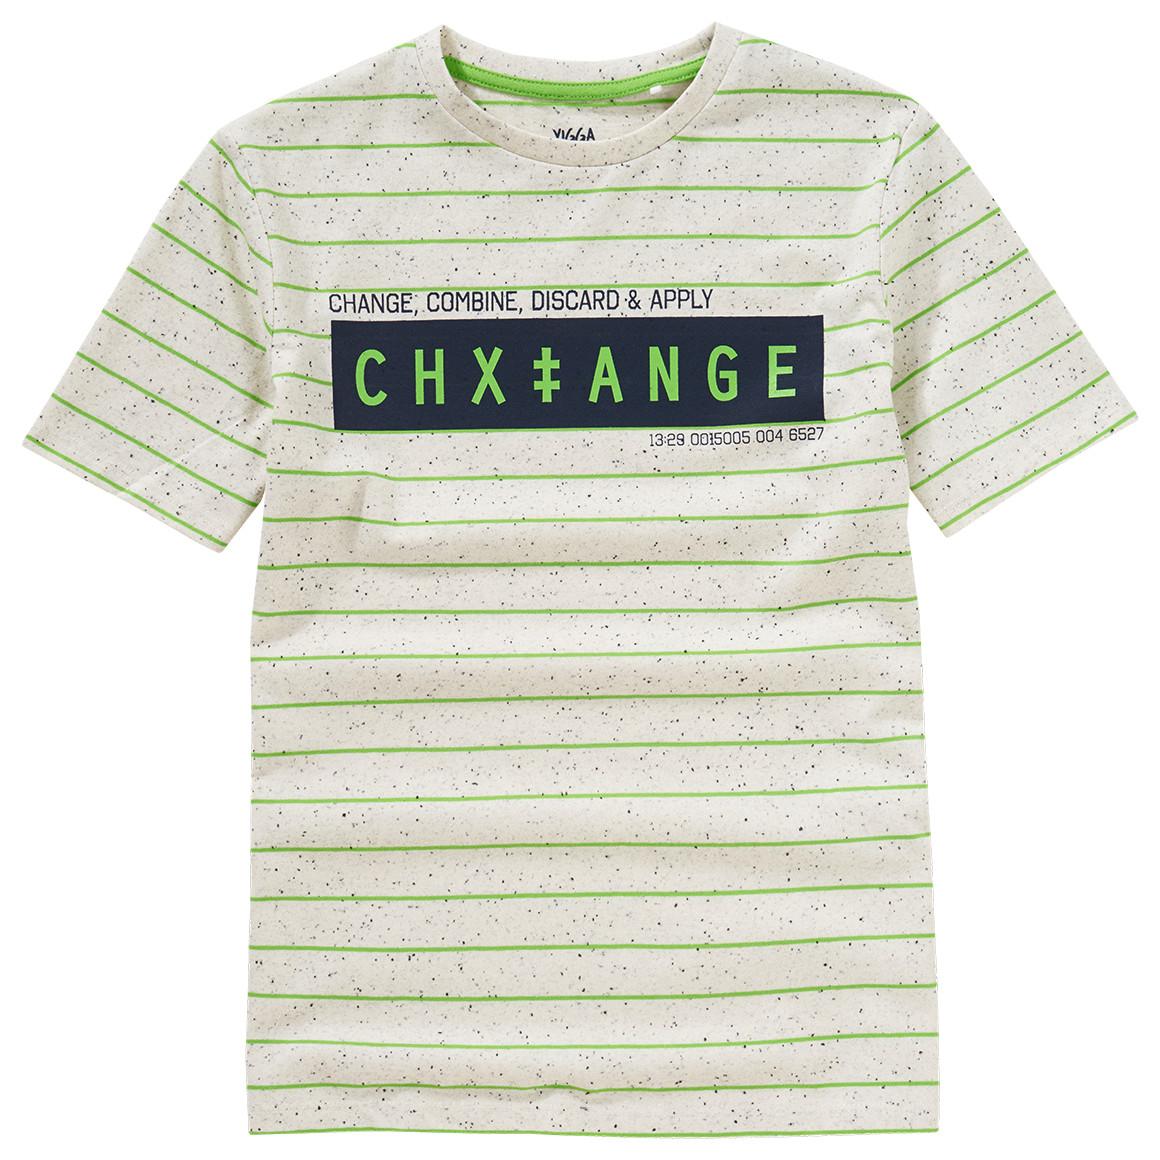 Boysoberteile - Jungen T-Shirt im Melange Look - Onlineshop Ernstings family